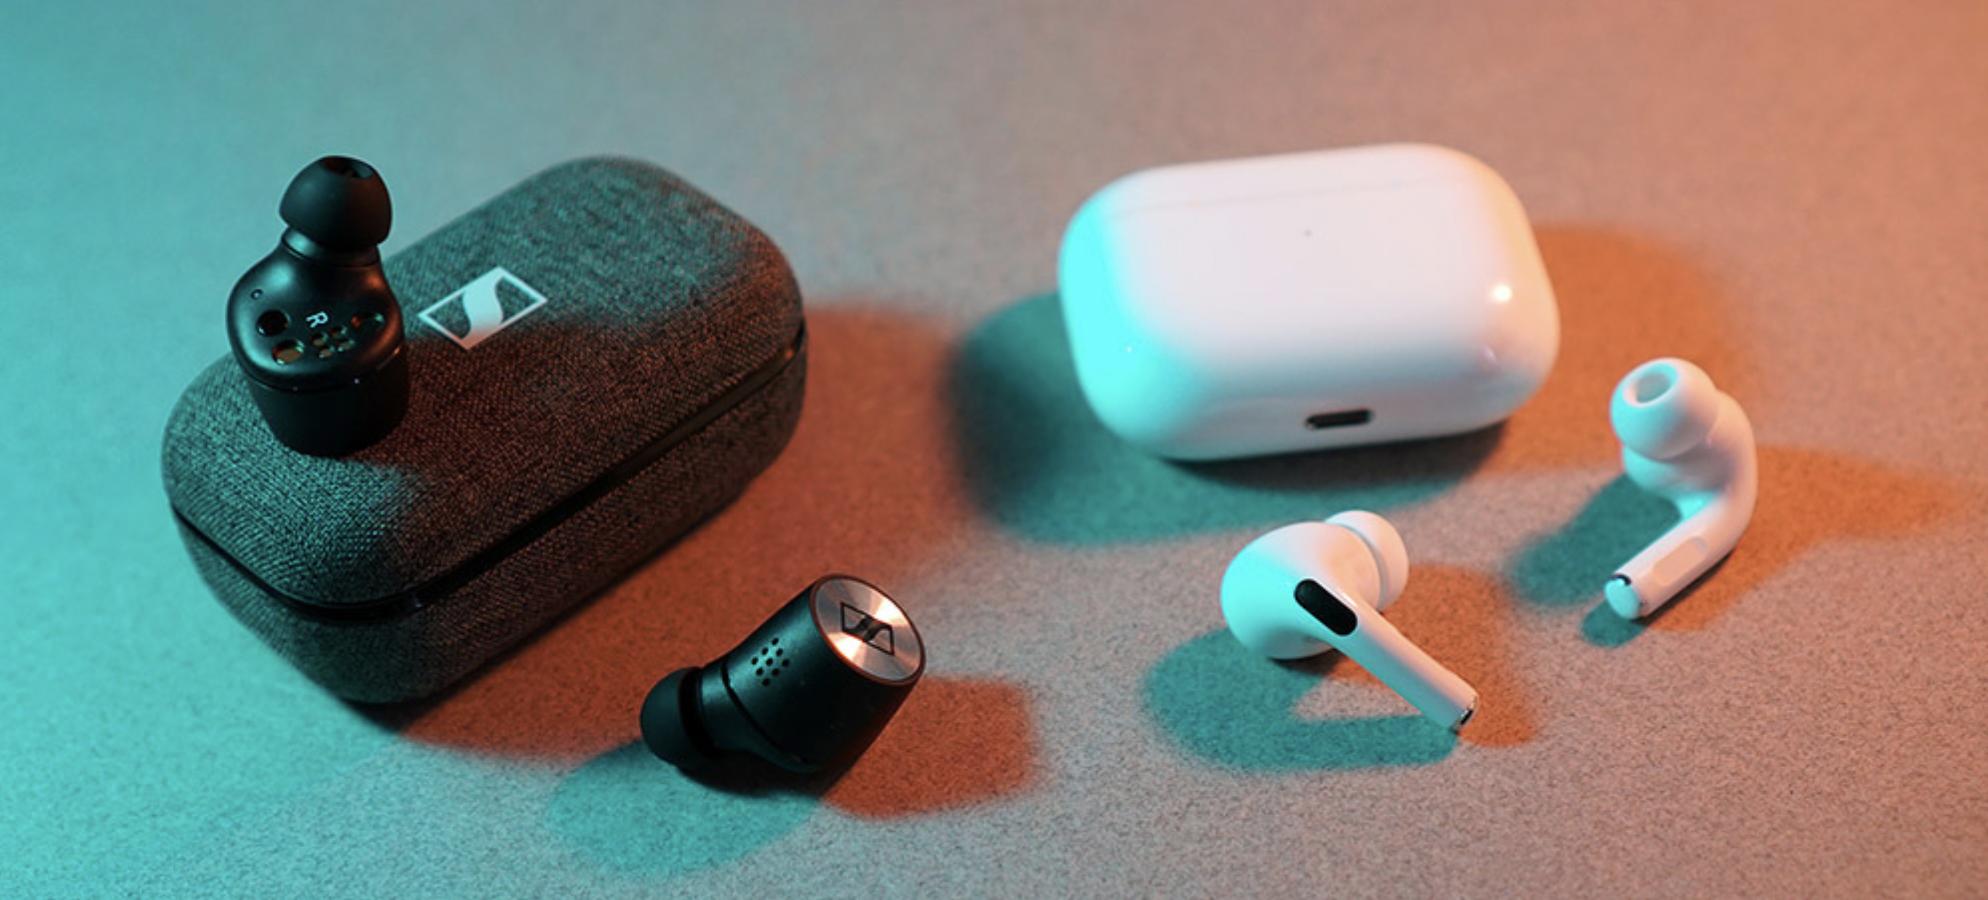 Sennheiser Momentum True Wireless 2 и Apple AirPods Pro